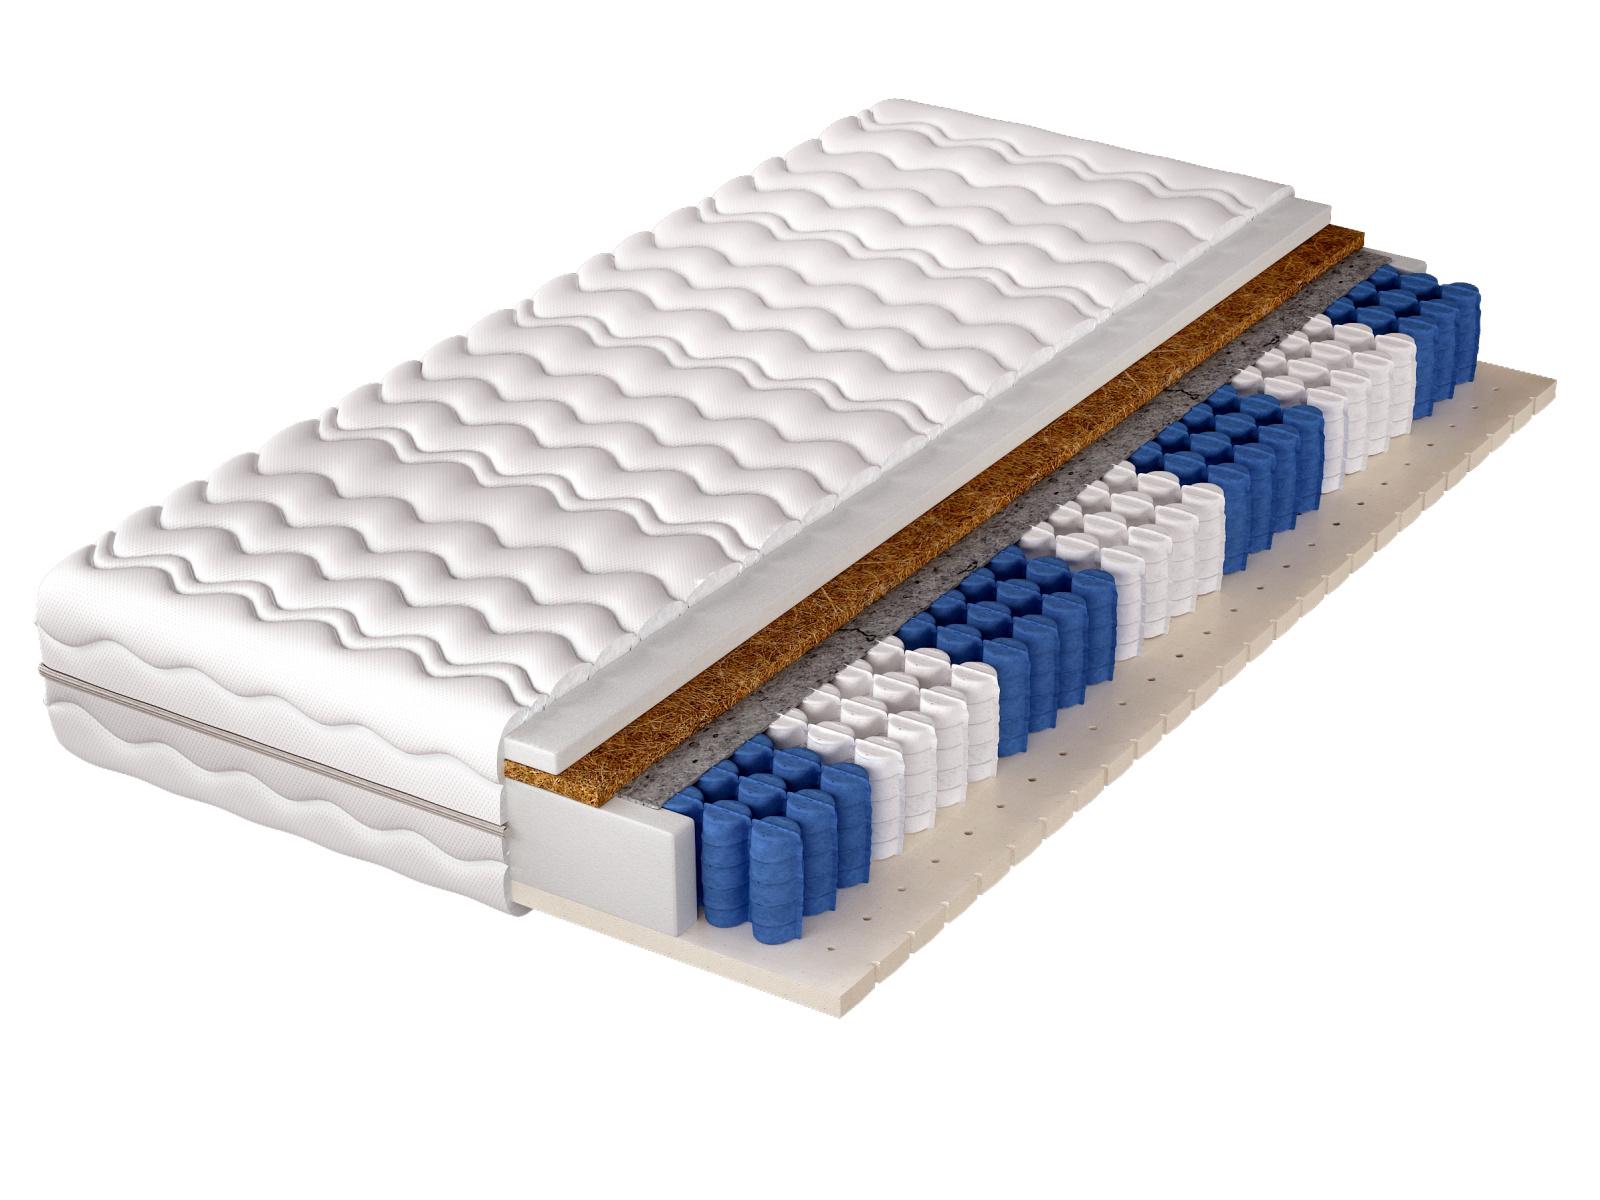 Smartshop Pružinová matrace ATLANTA 80x200 cm